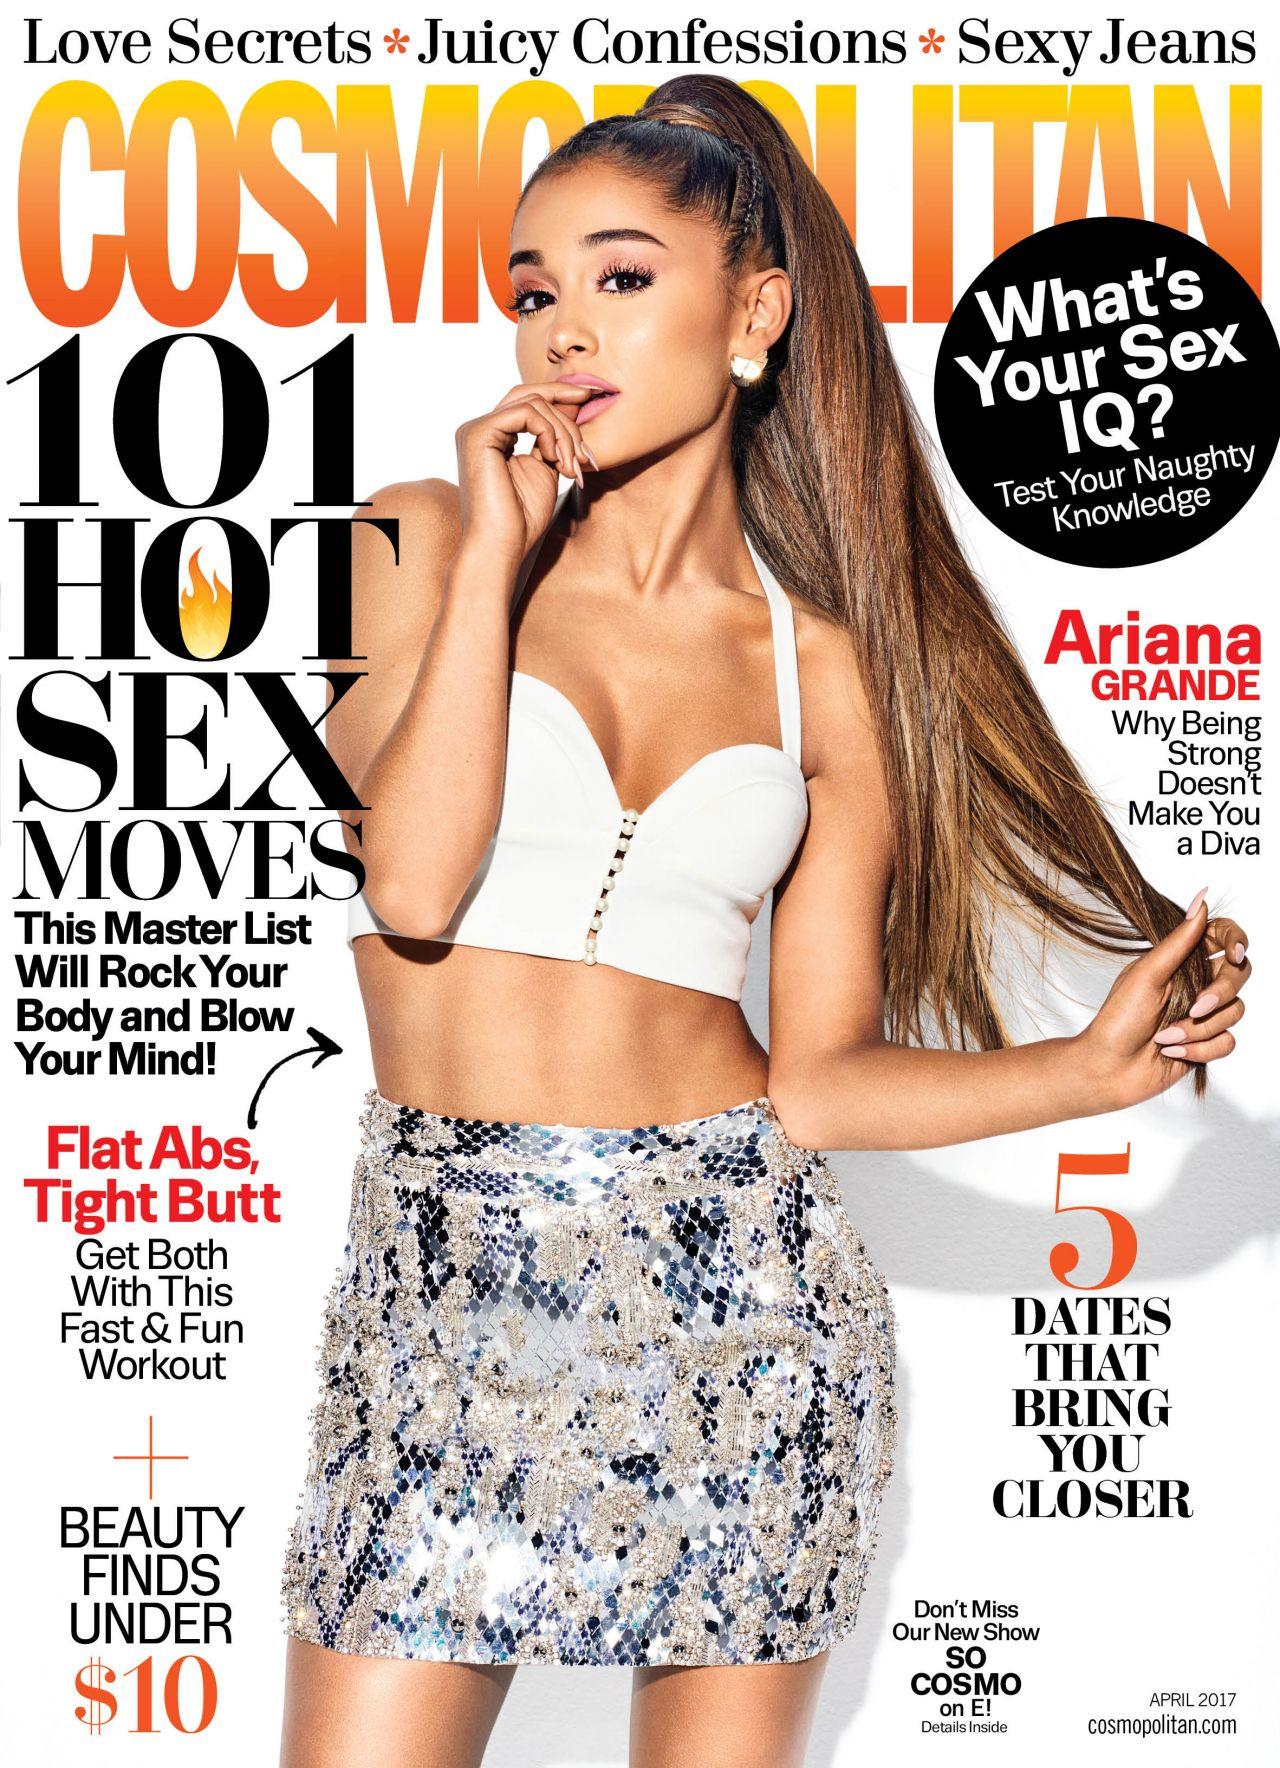 ariana-grande-cosmopolitan-magazine-april-2017-cover-and-photos-2.jpg